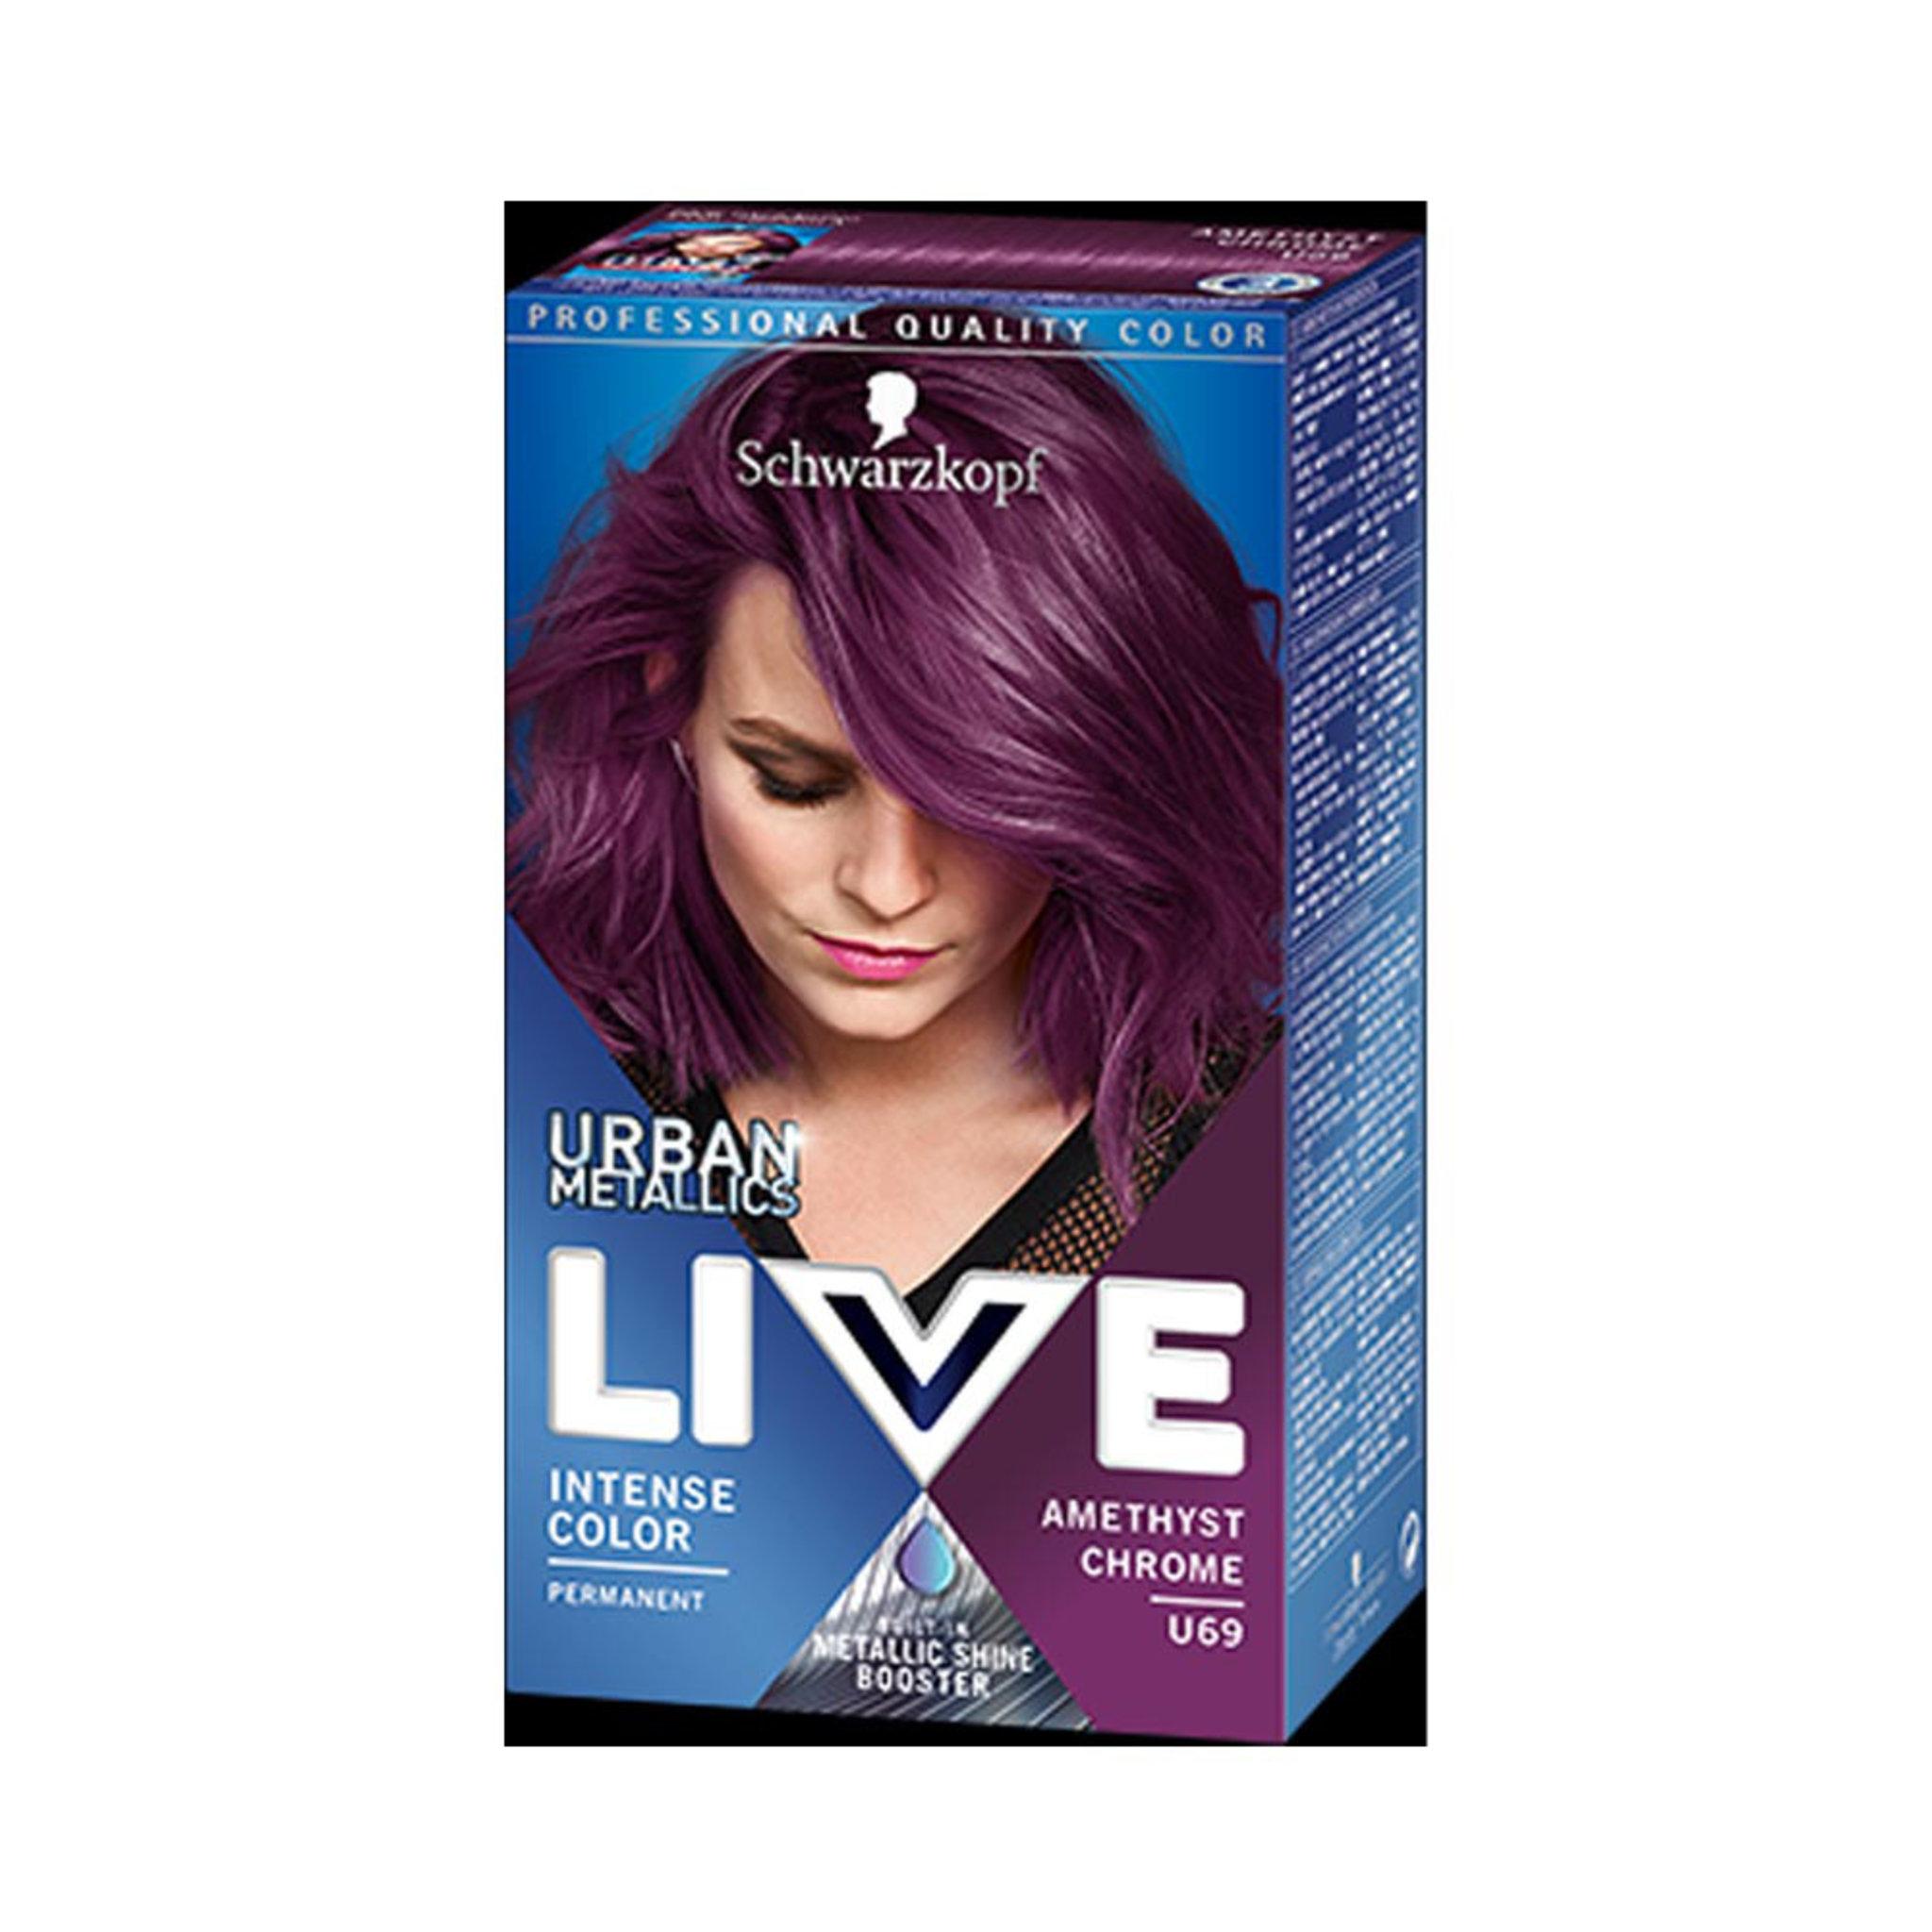 LIVE Intense Color - U69 Amethyst Chrome